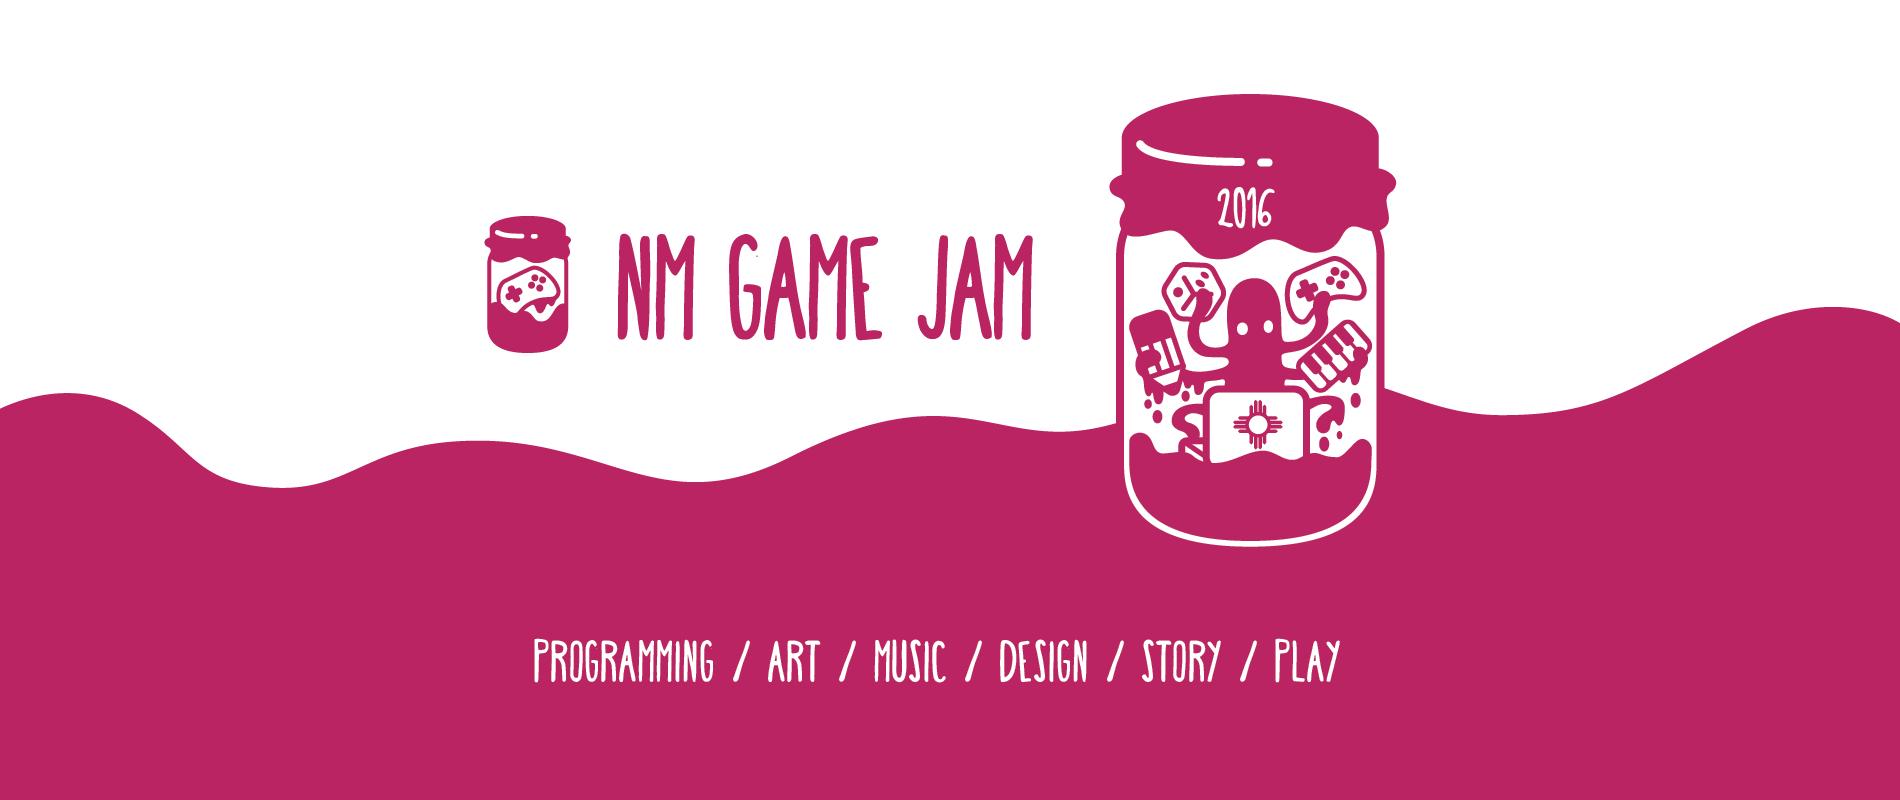 NM Game Jam